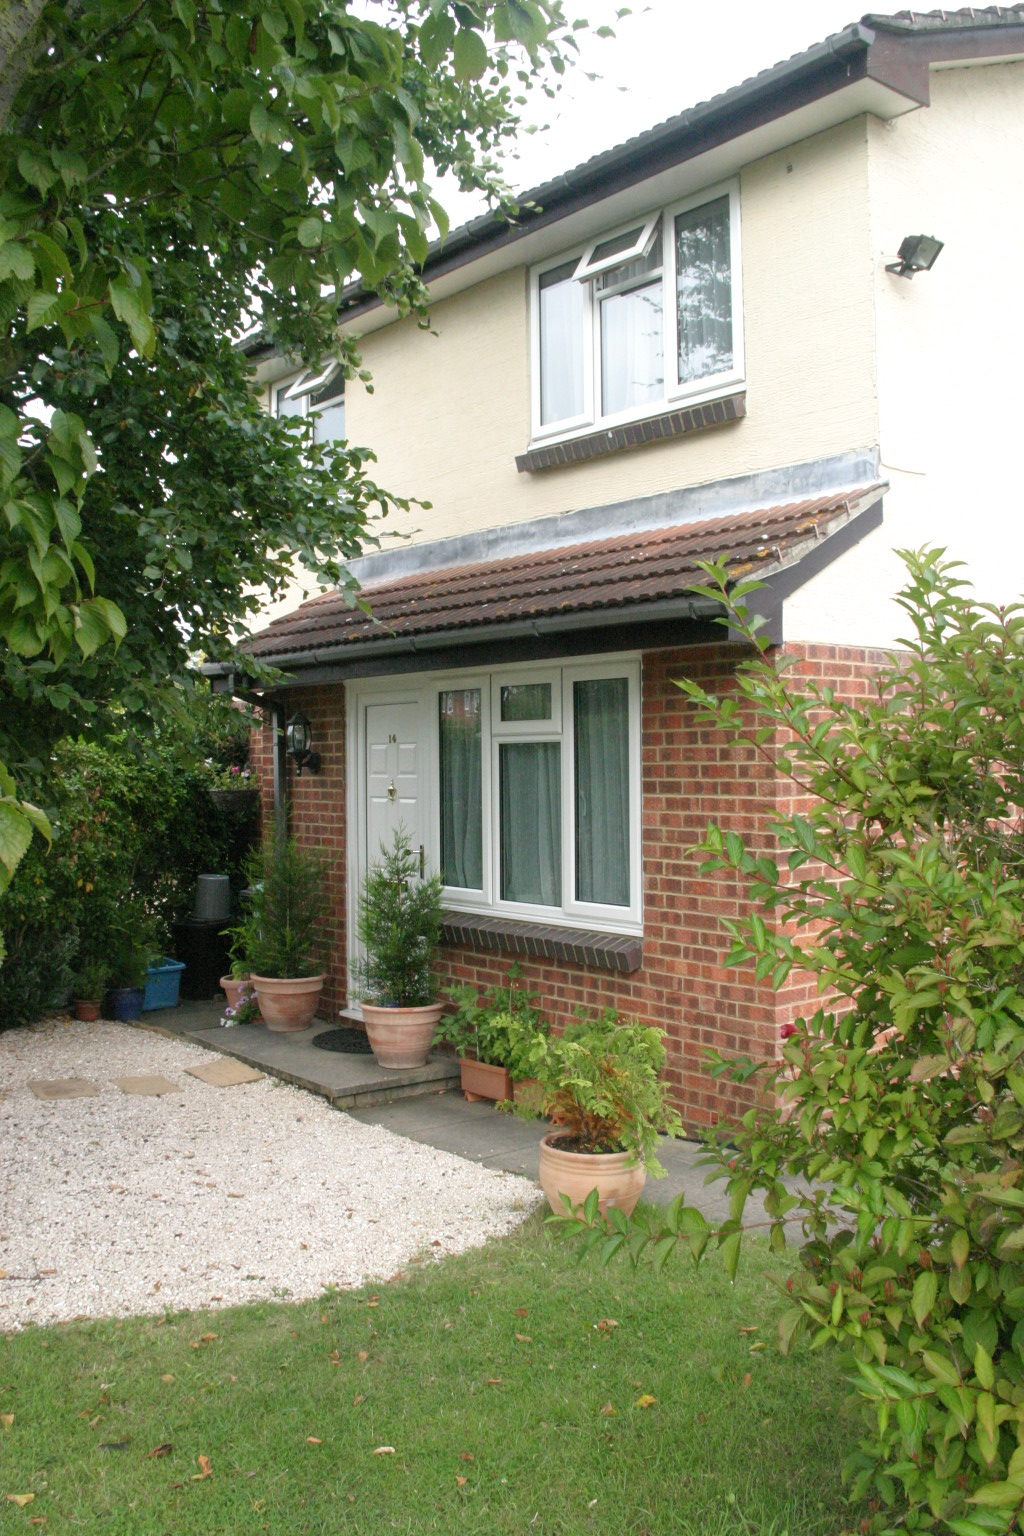 1 Bedroom Semi-Detached House, Egham